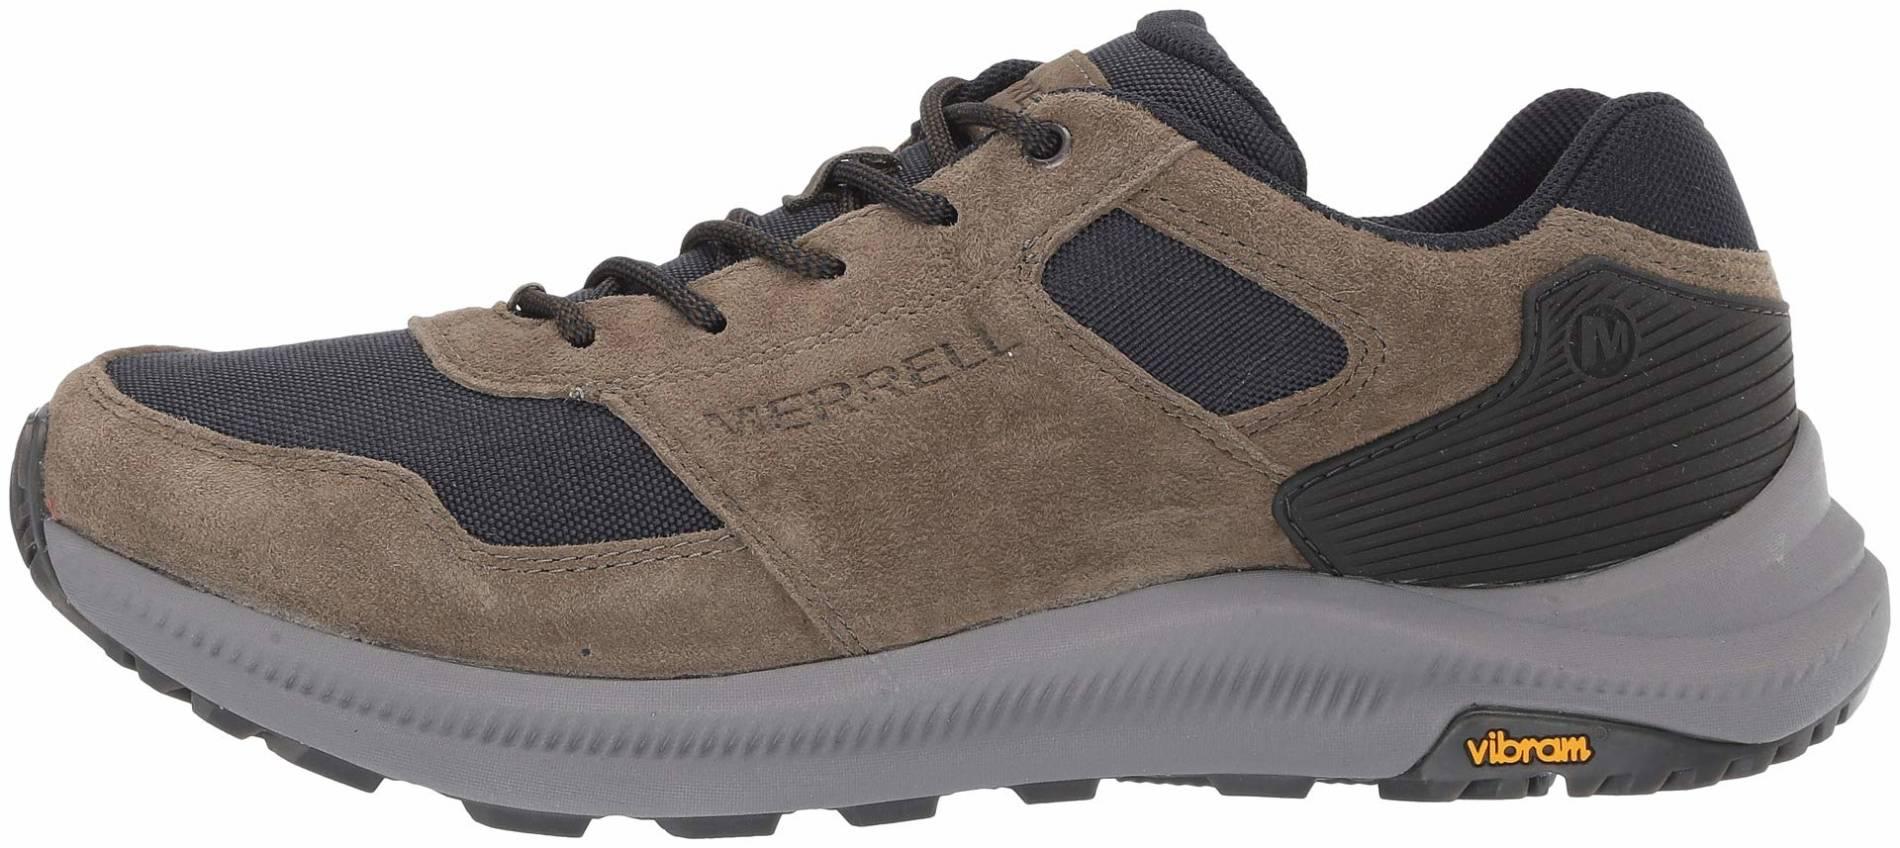 9 Medium US NEW Merrell J033857 Men/'s Ontario 85 Hiking Shoes in Gold